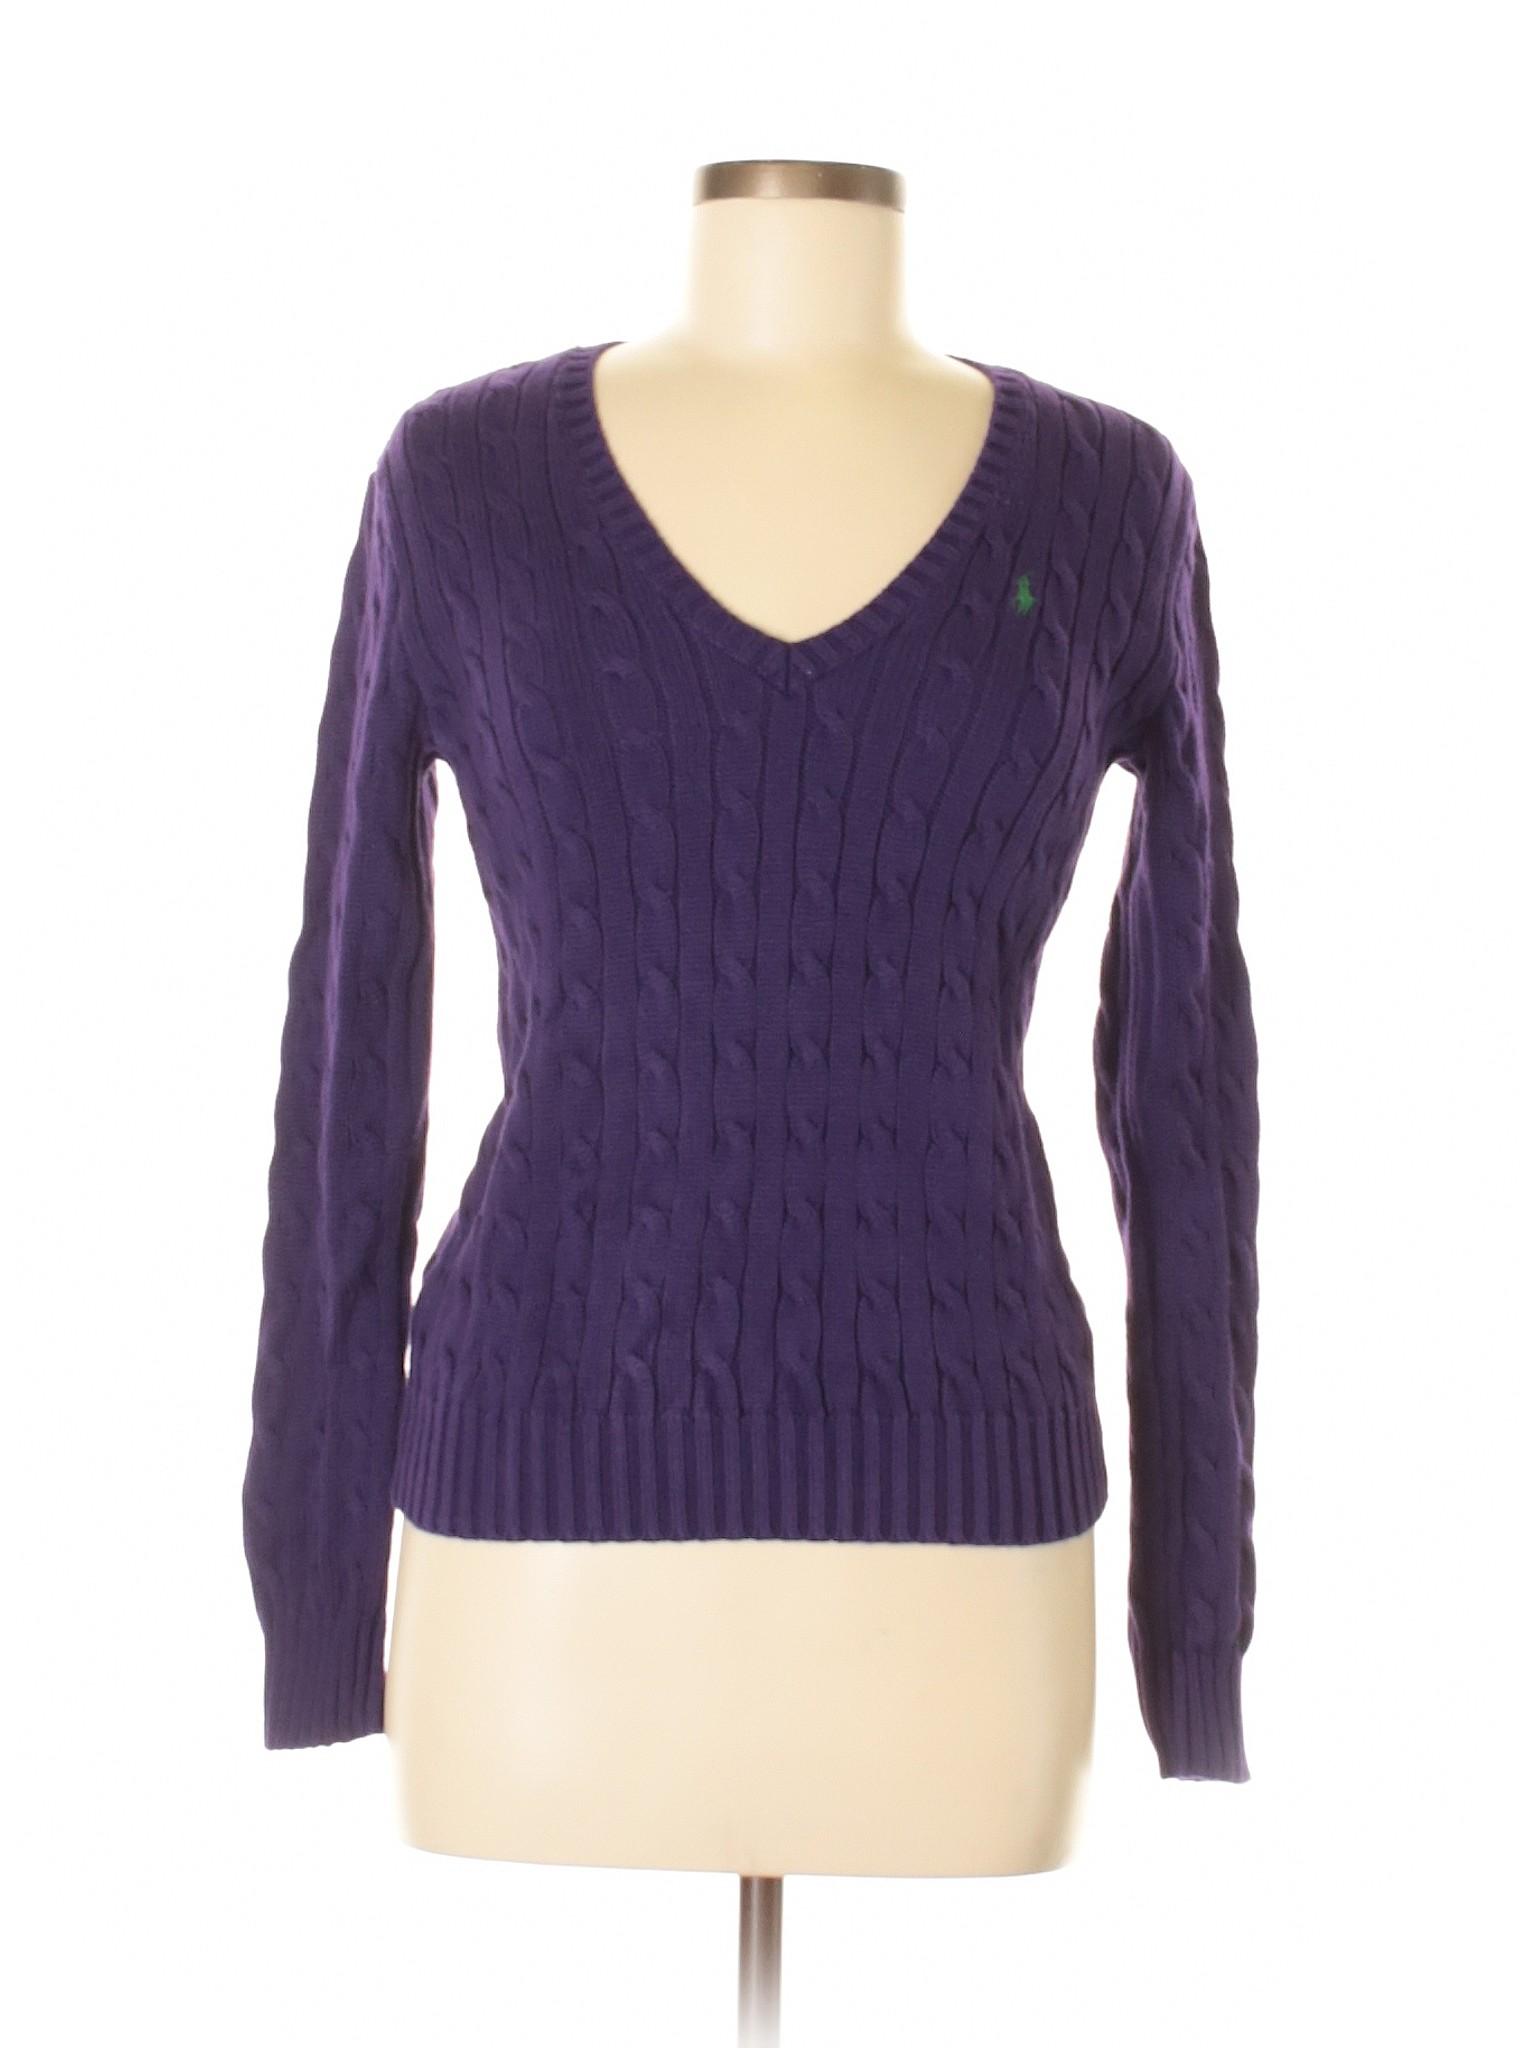 Boutique Sweater Ralph winter Pullover Lauren Sport x6Cxq1